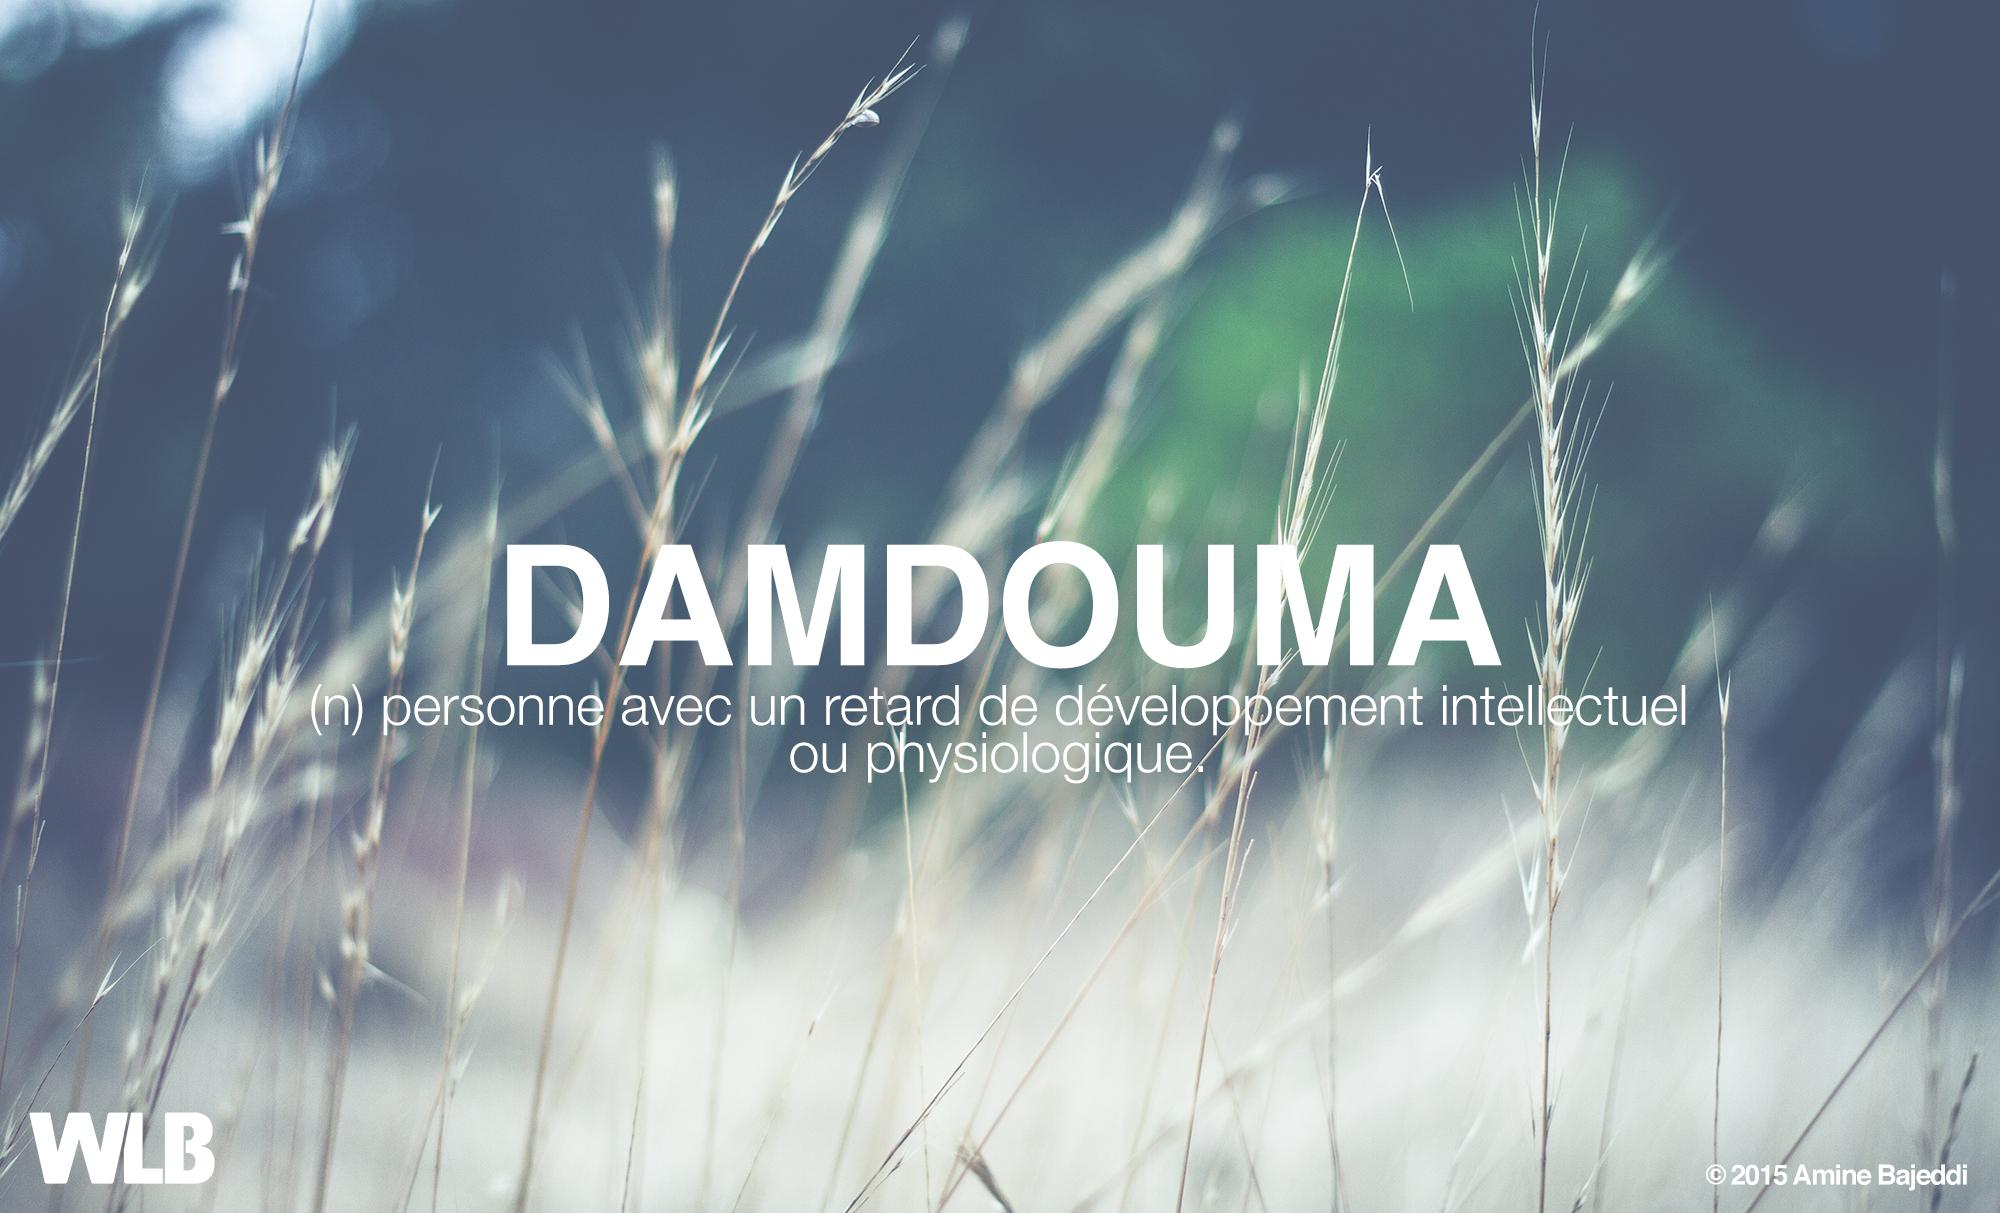 damdouma